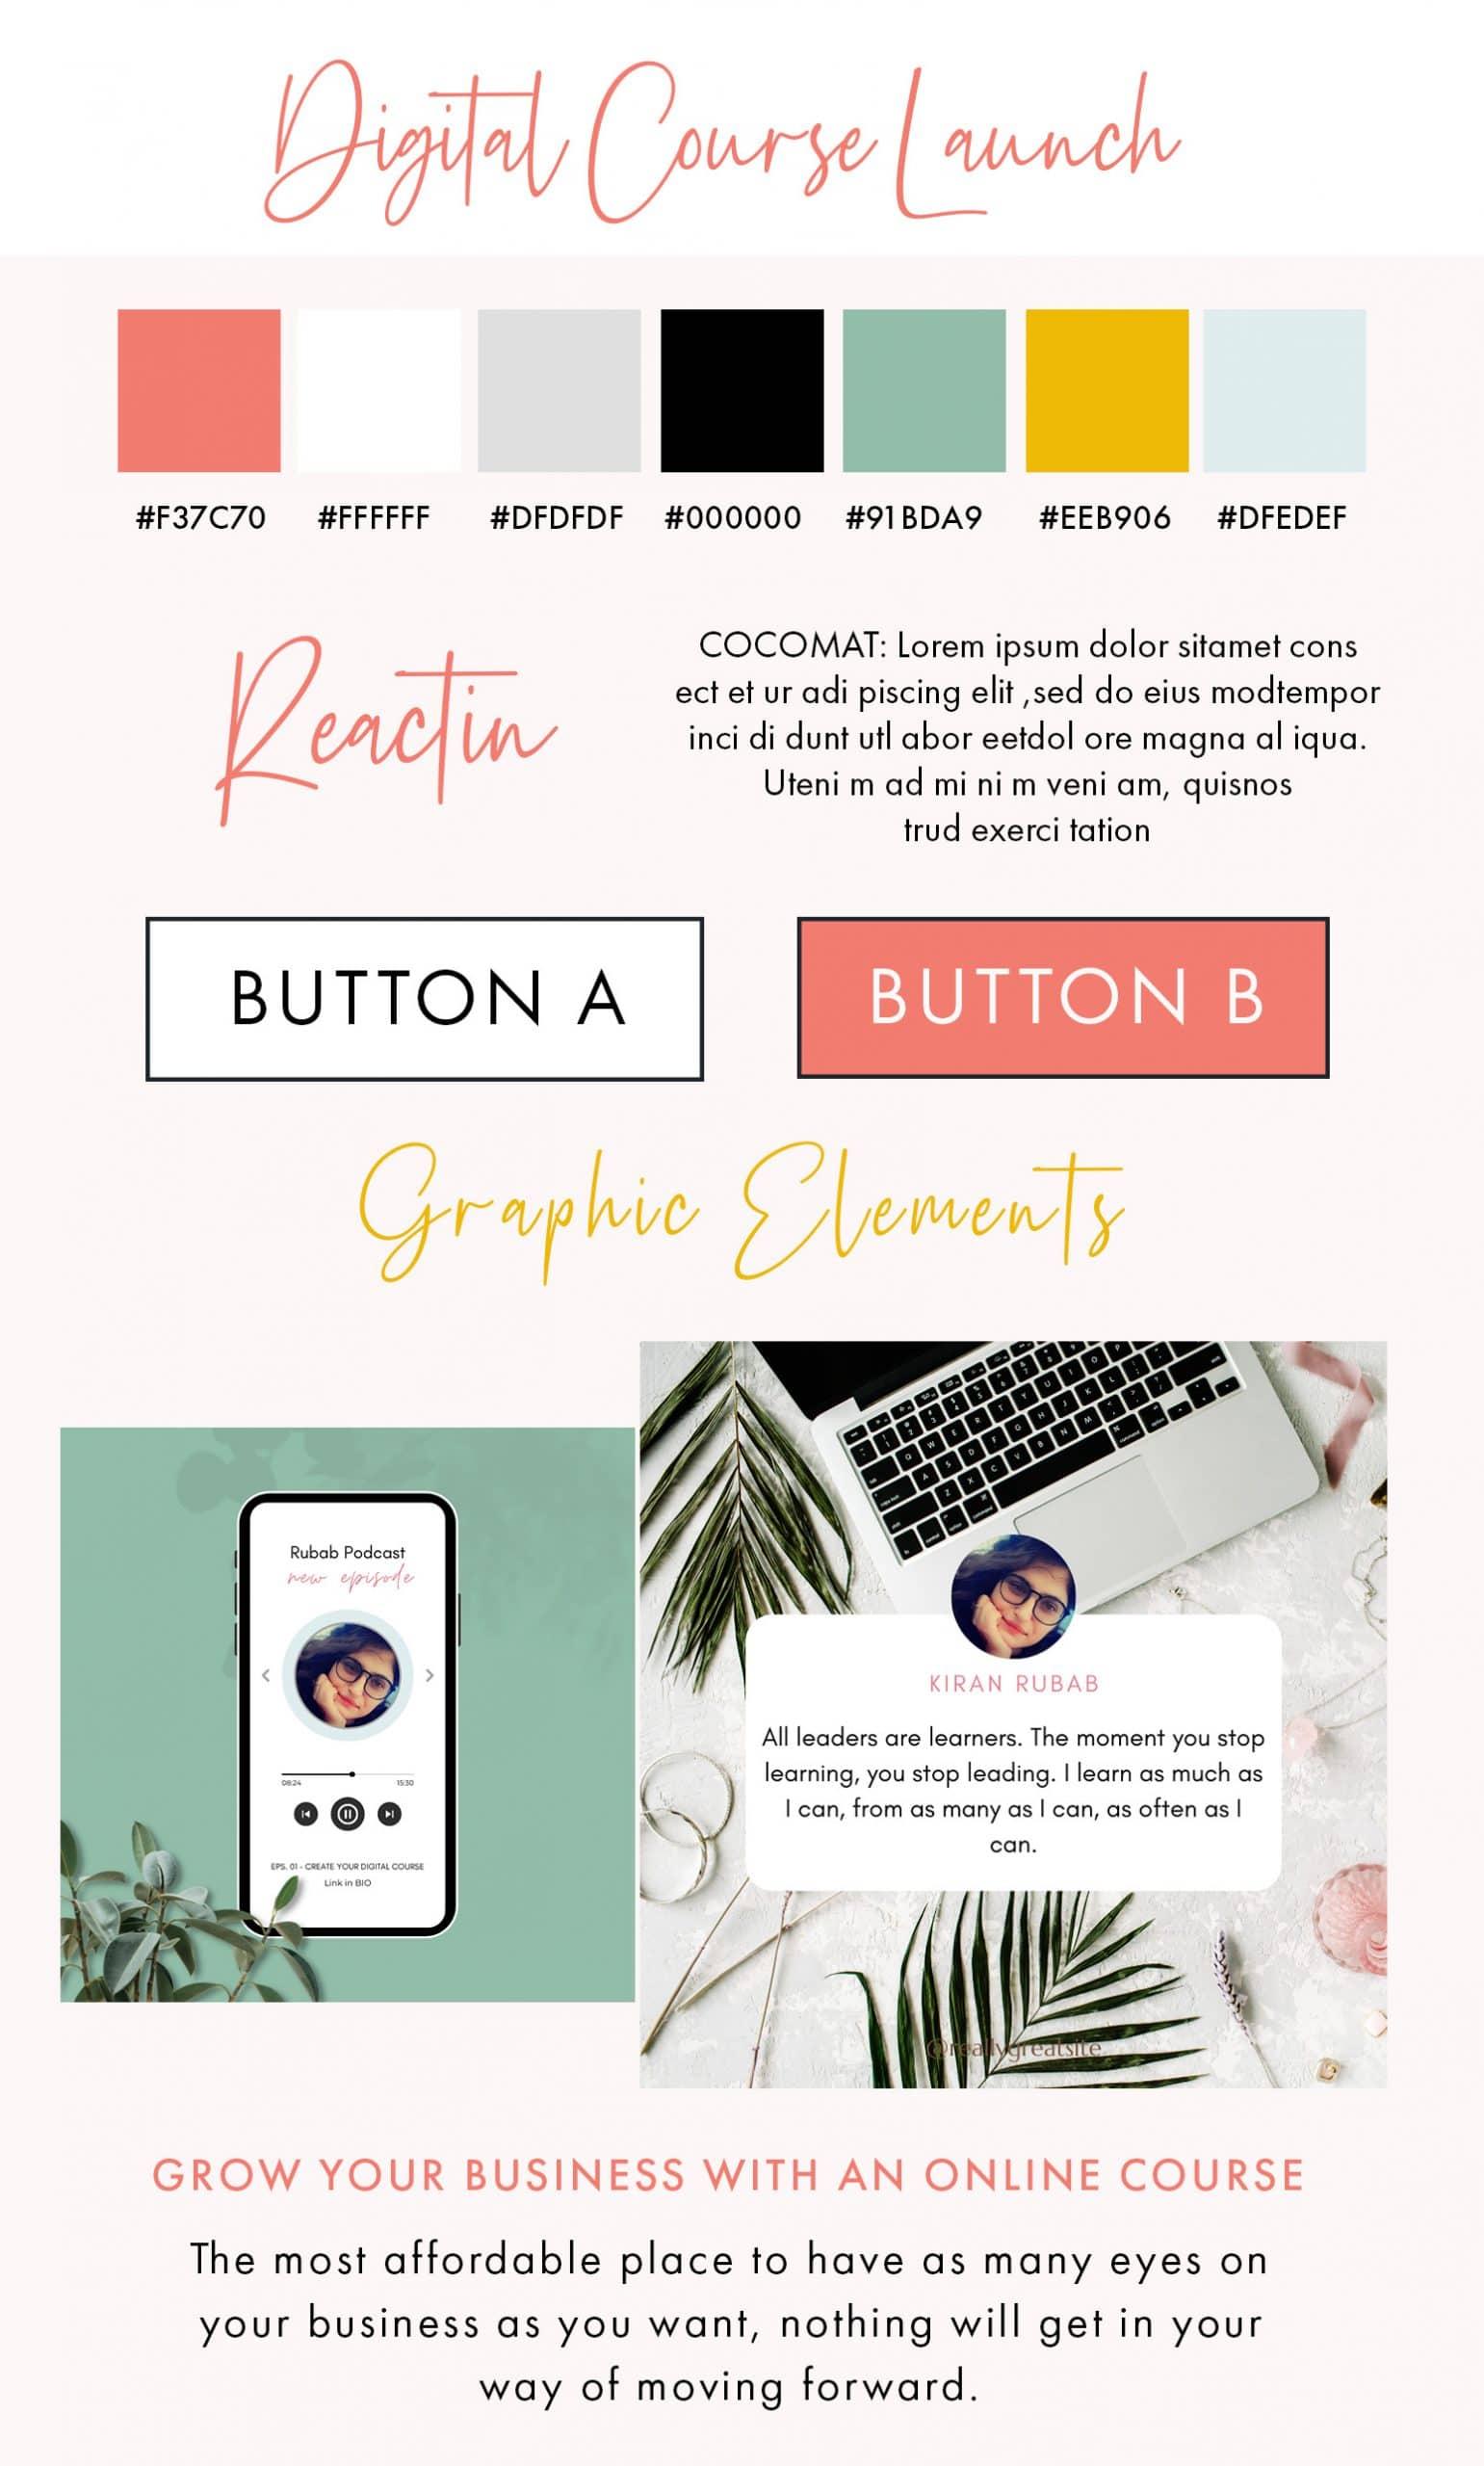 Digital-Course-Launch-Brand-Board